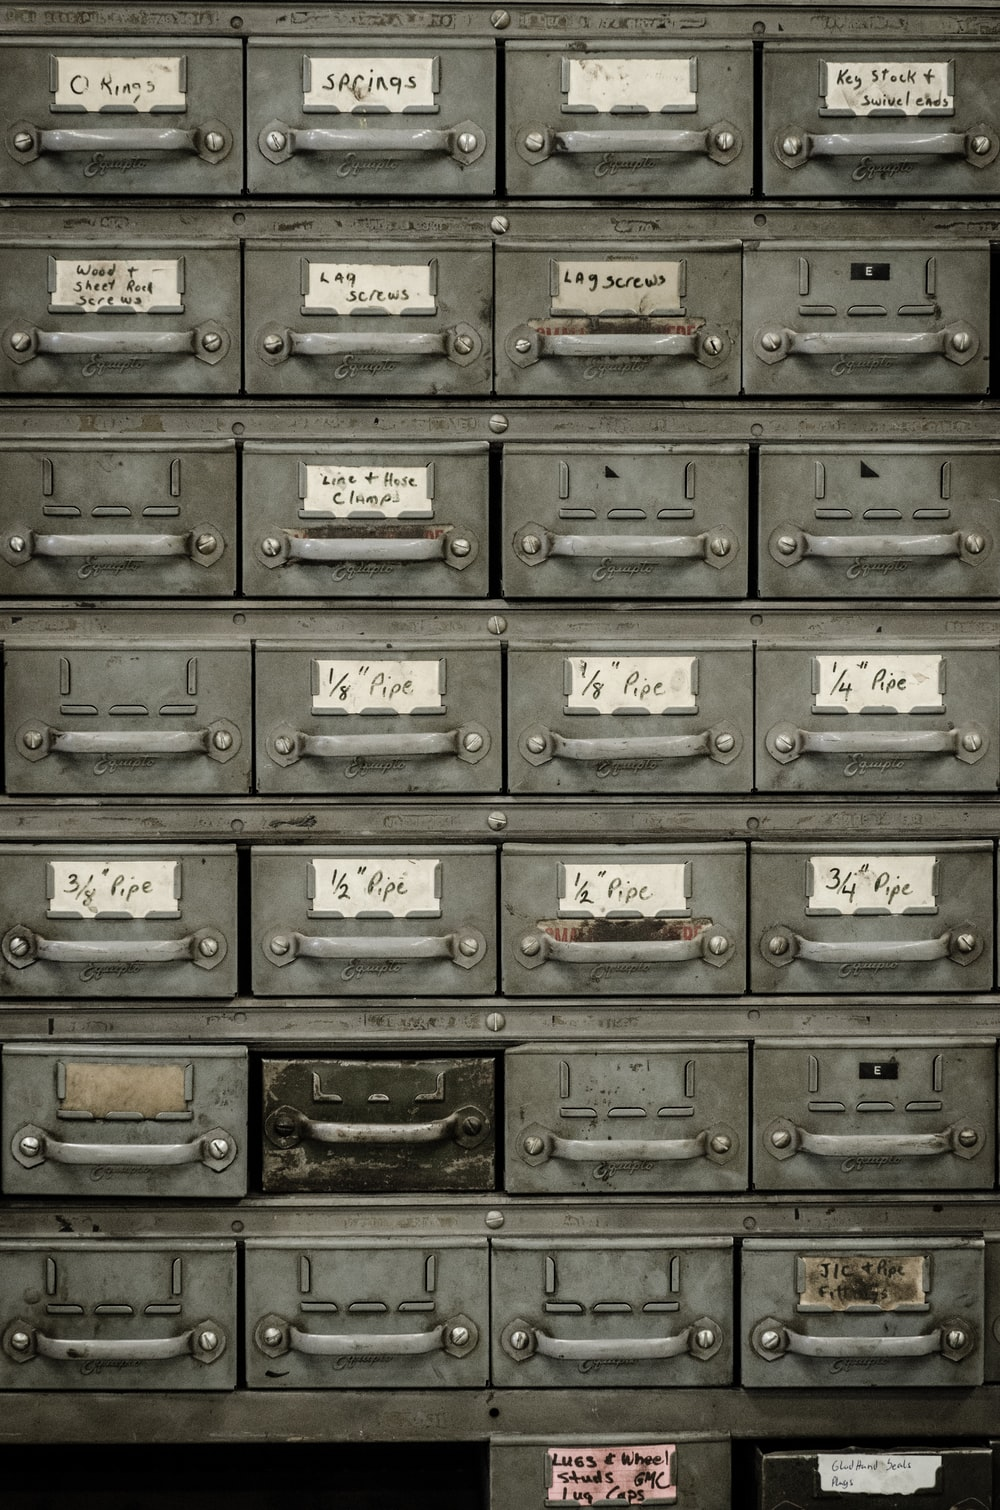 gray metal drawers